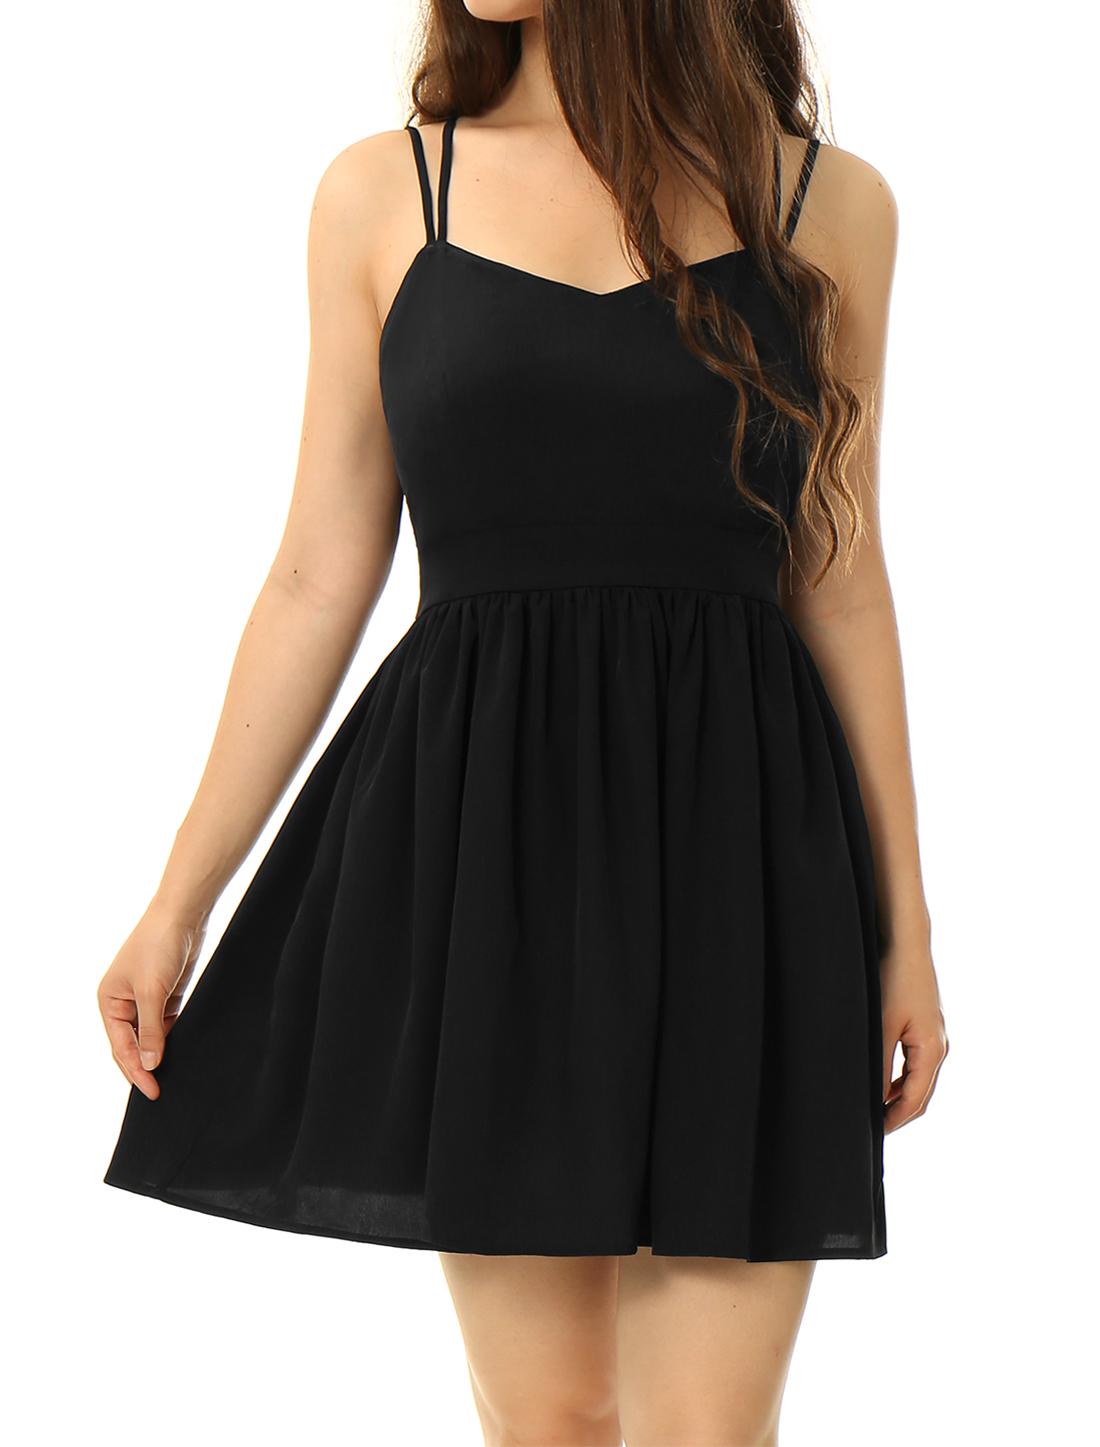 Women Dual Spaghetti Straps Criss Cross Back Mini Dress Black XS